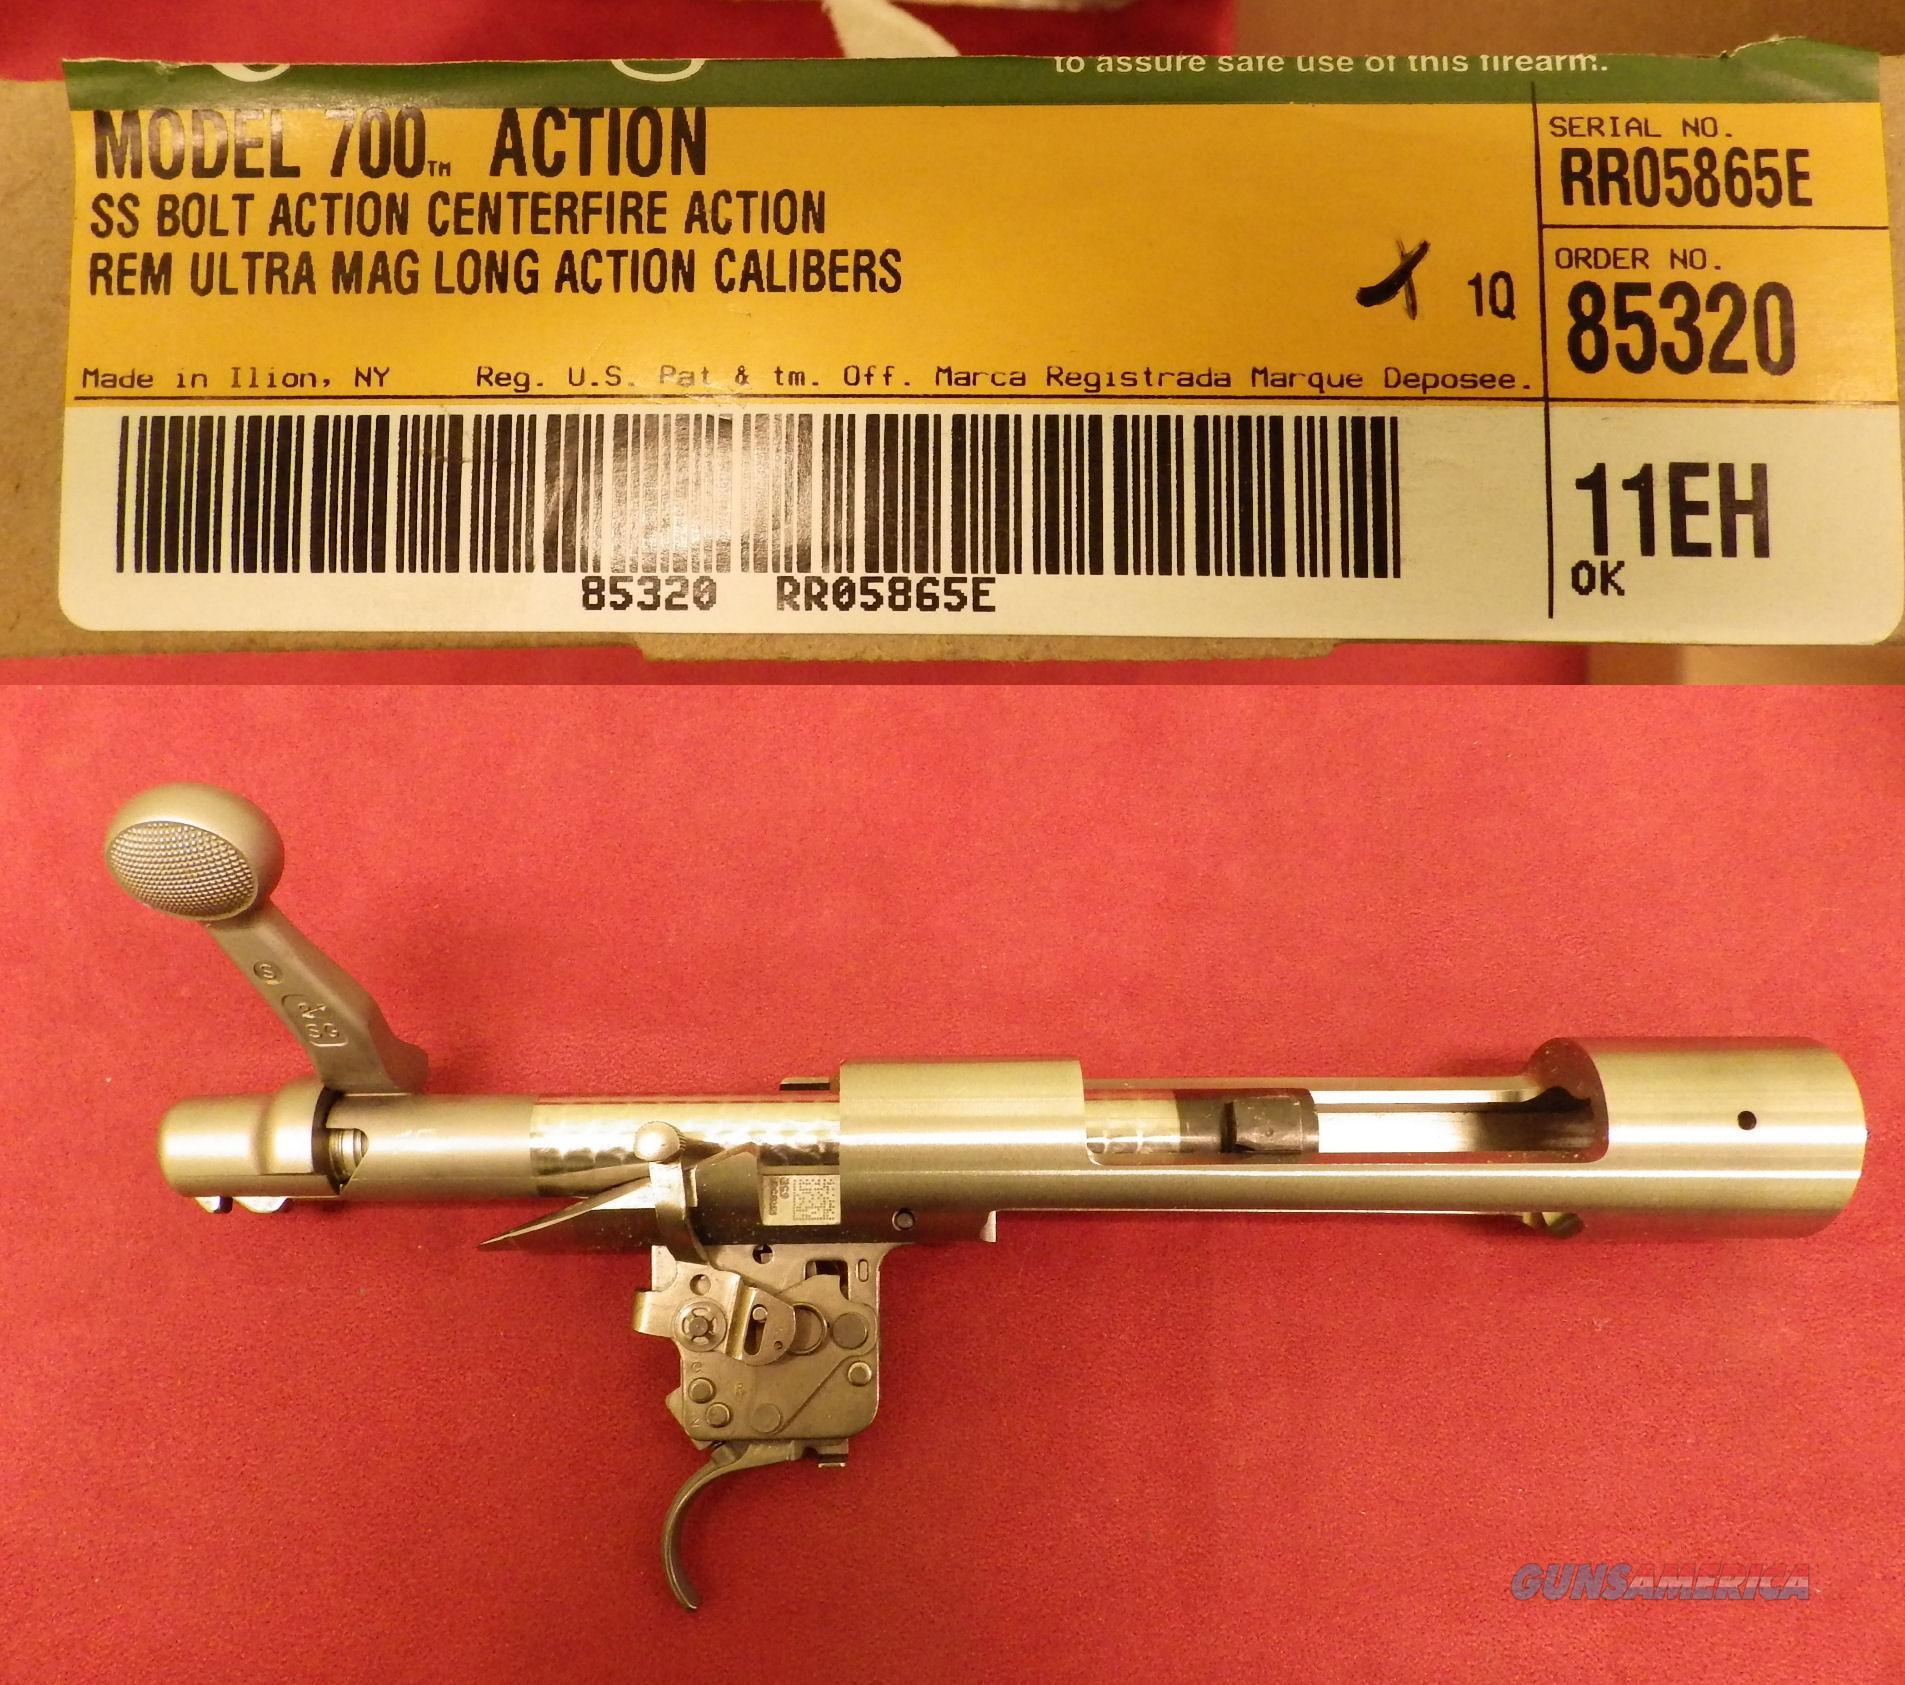 Remington 700 Long Action Ultra Magnum, RH, Stainless Steel, NIB  Guns > Rifles > Remington Rifles - Modern > Model 700 > Sporting